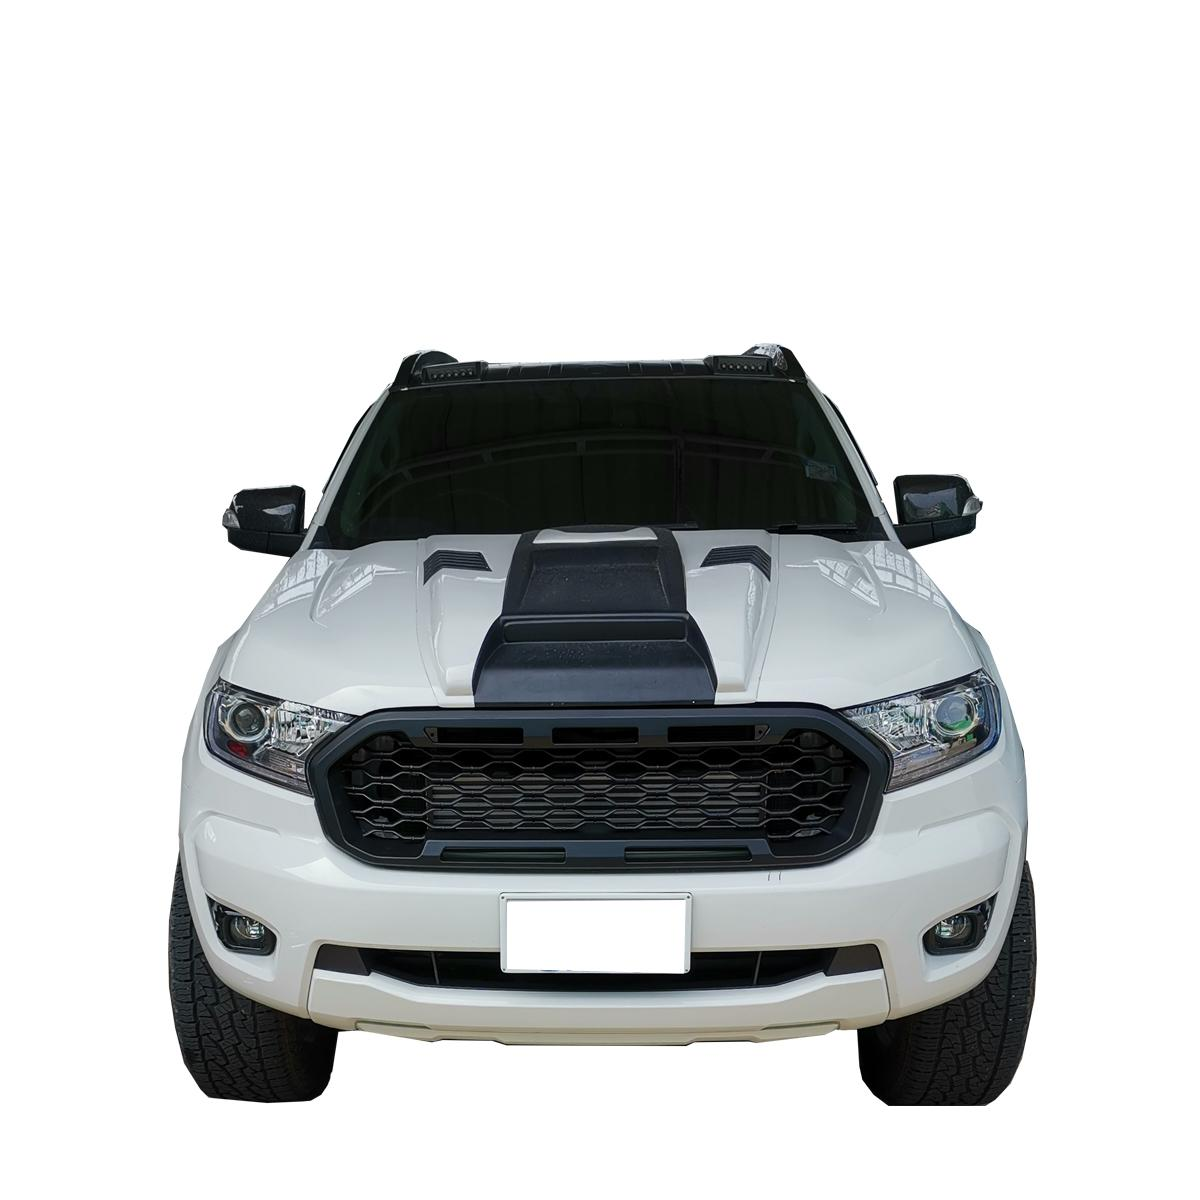 Schwarz matter Frontgrill Khlergrill Ford Ranger Wildtrak 2019 ...